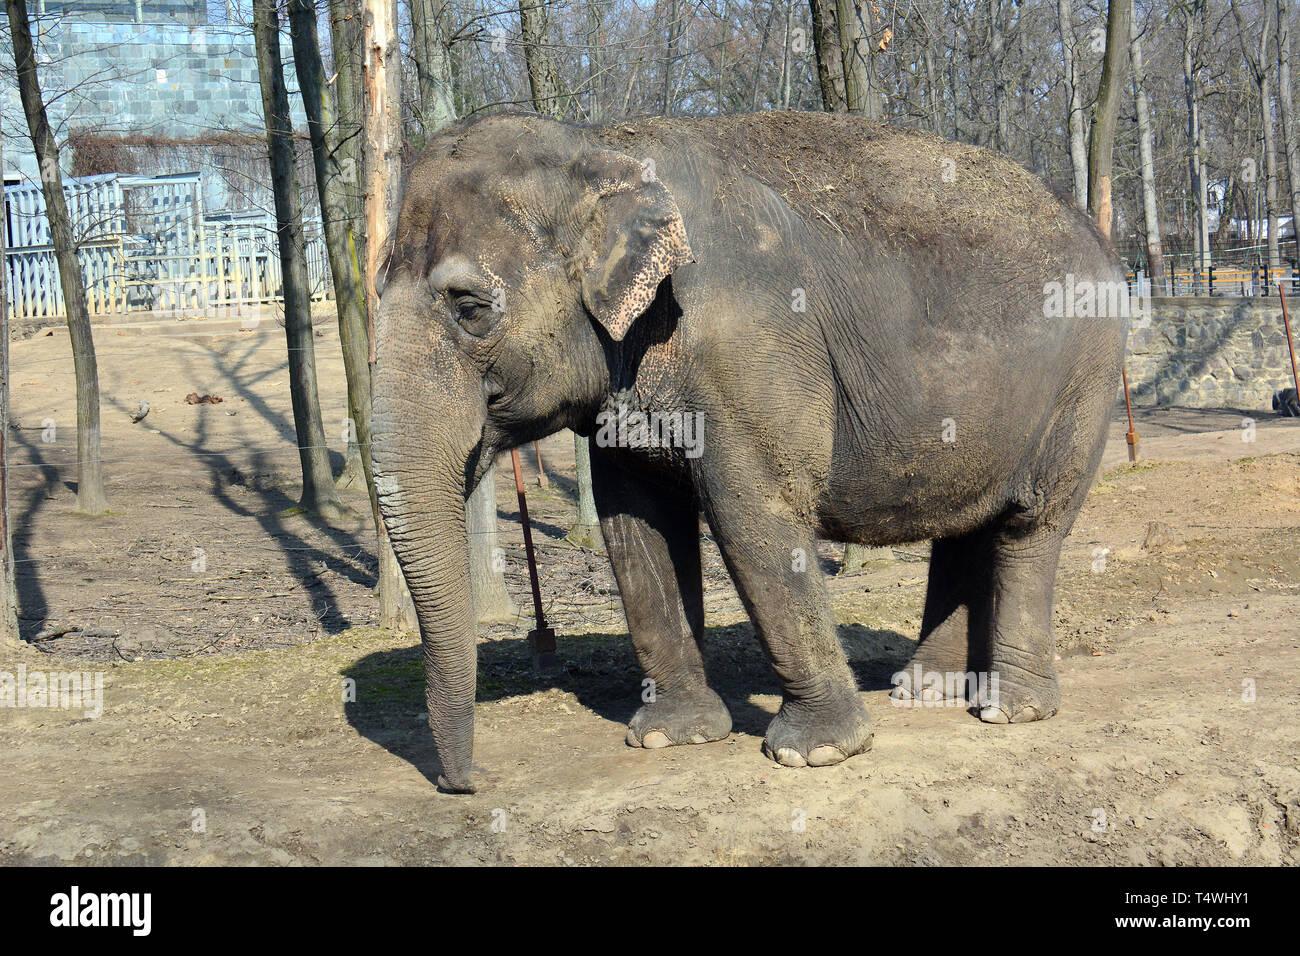 Asian elephant, Asiatische Elefant, Elephas maximus, ázsiai elefánt - Stock Image